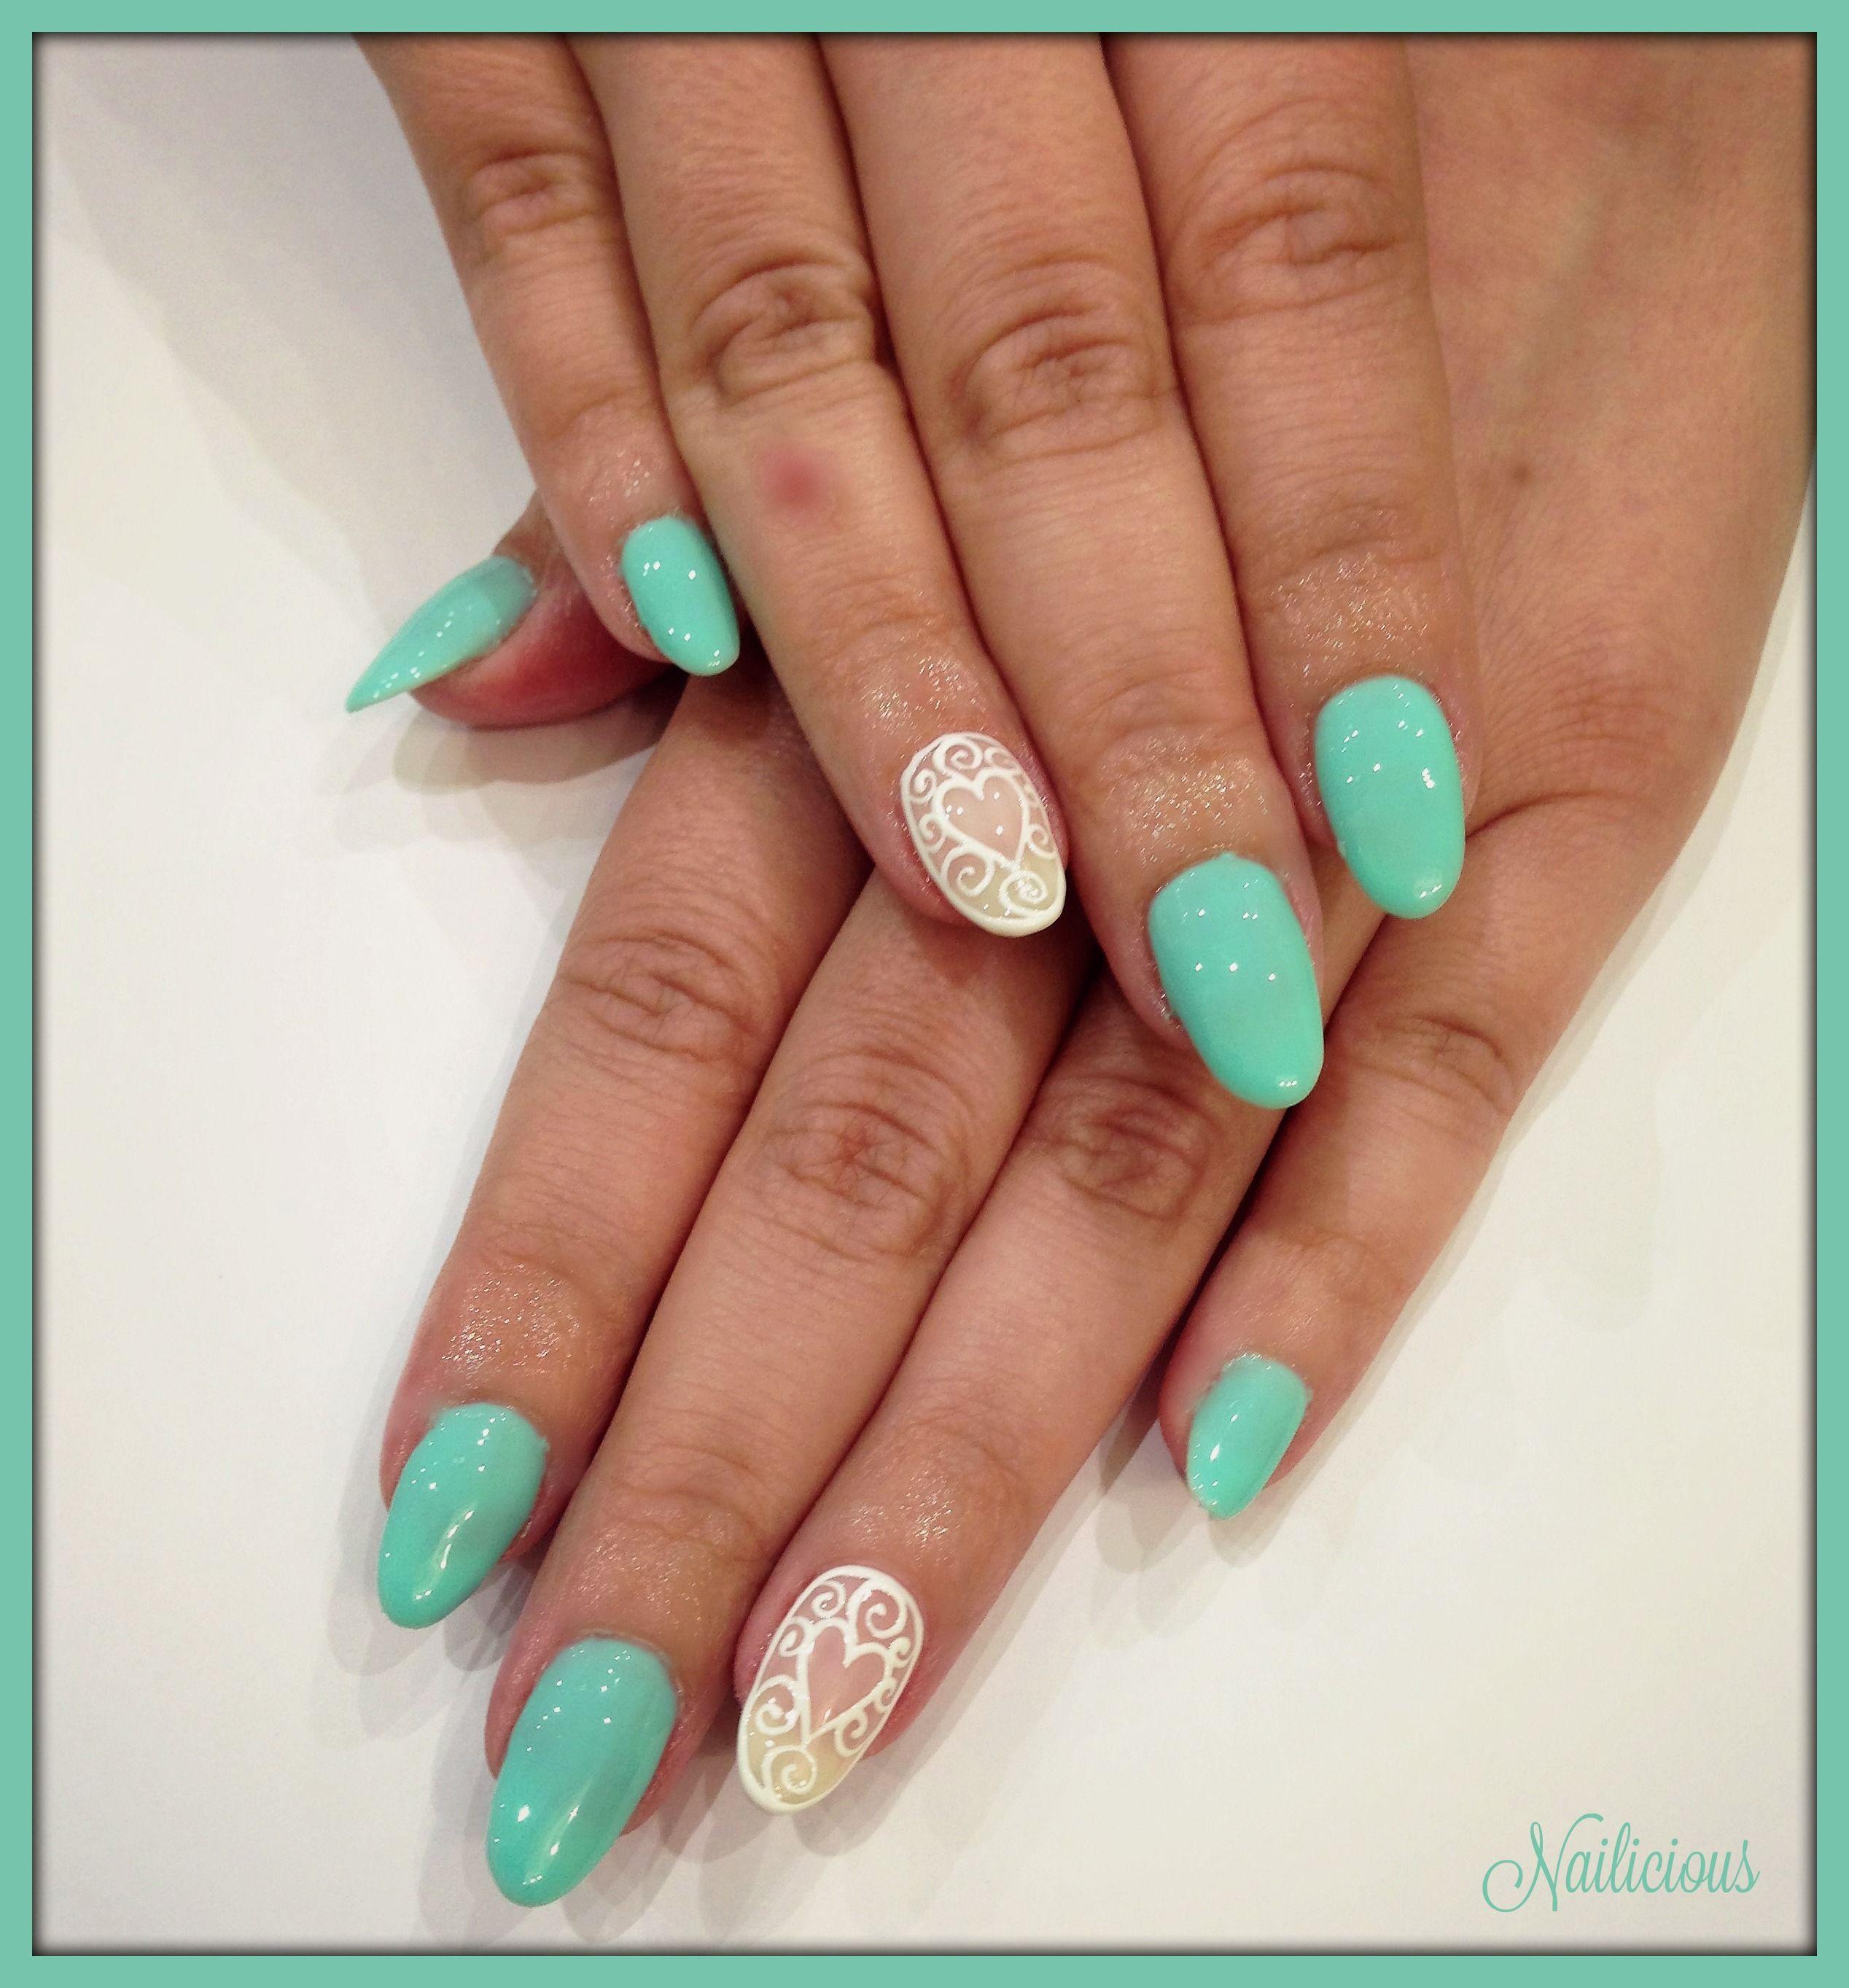 Veraman With Baroque Nail Art Nailicious My Beauty Salon Pinterest